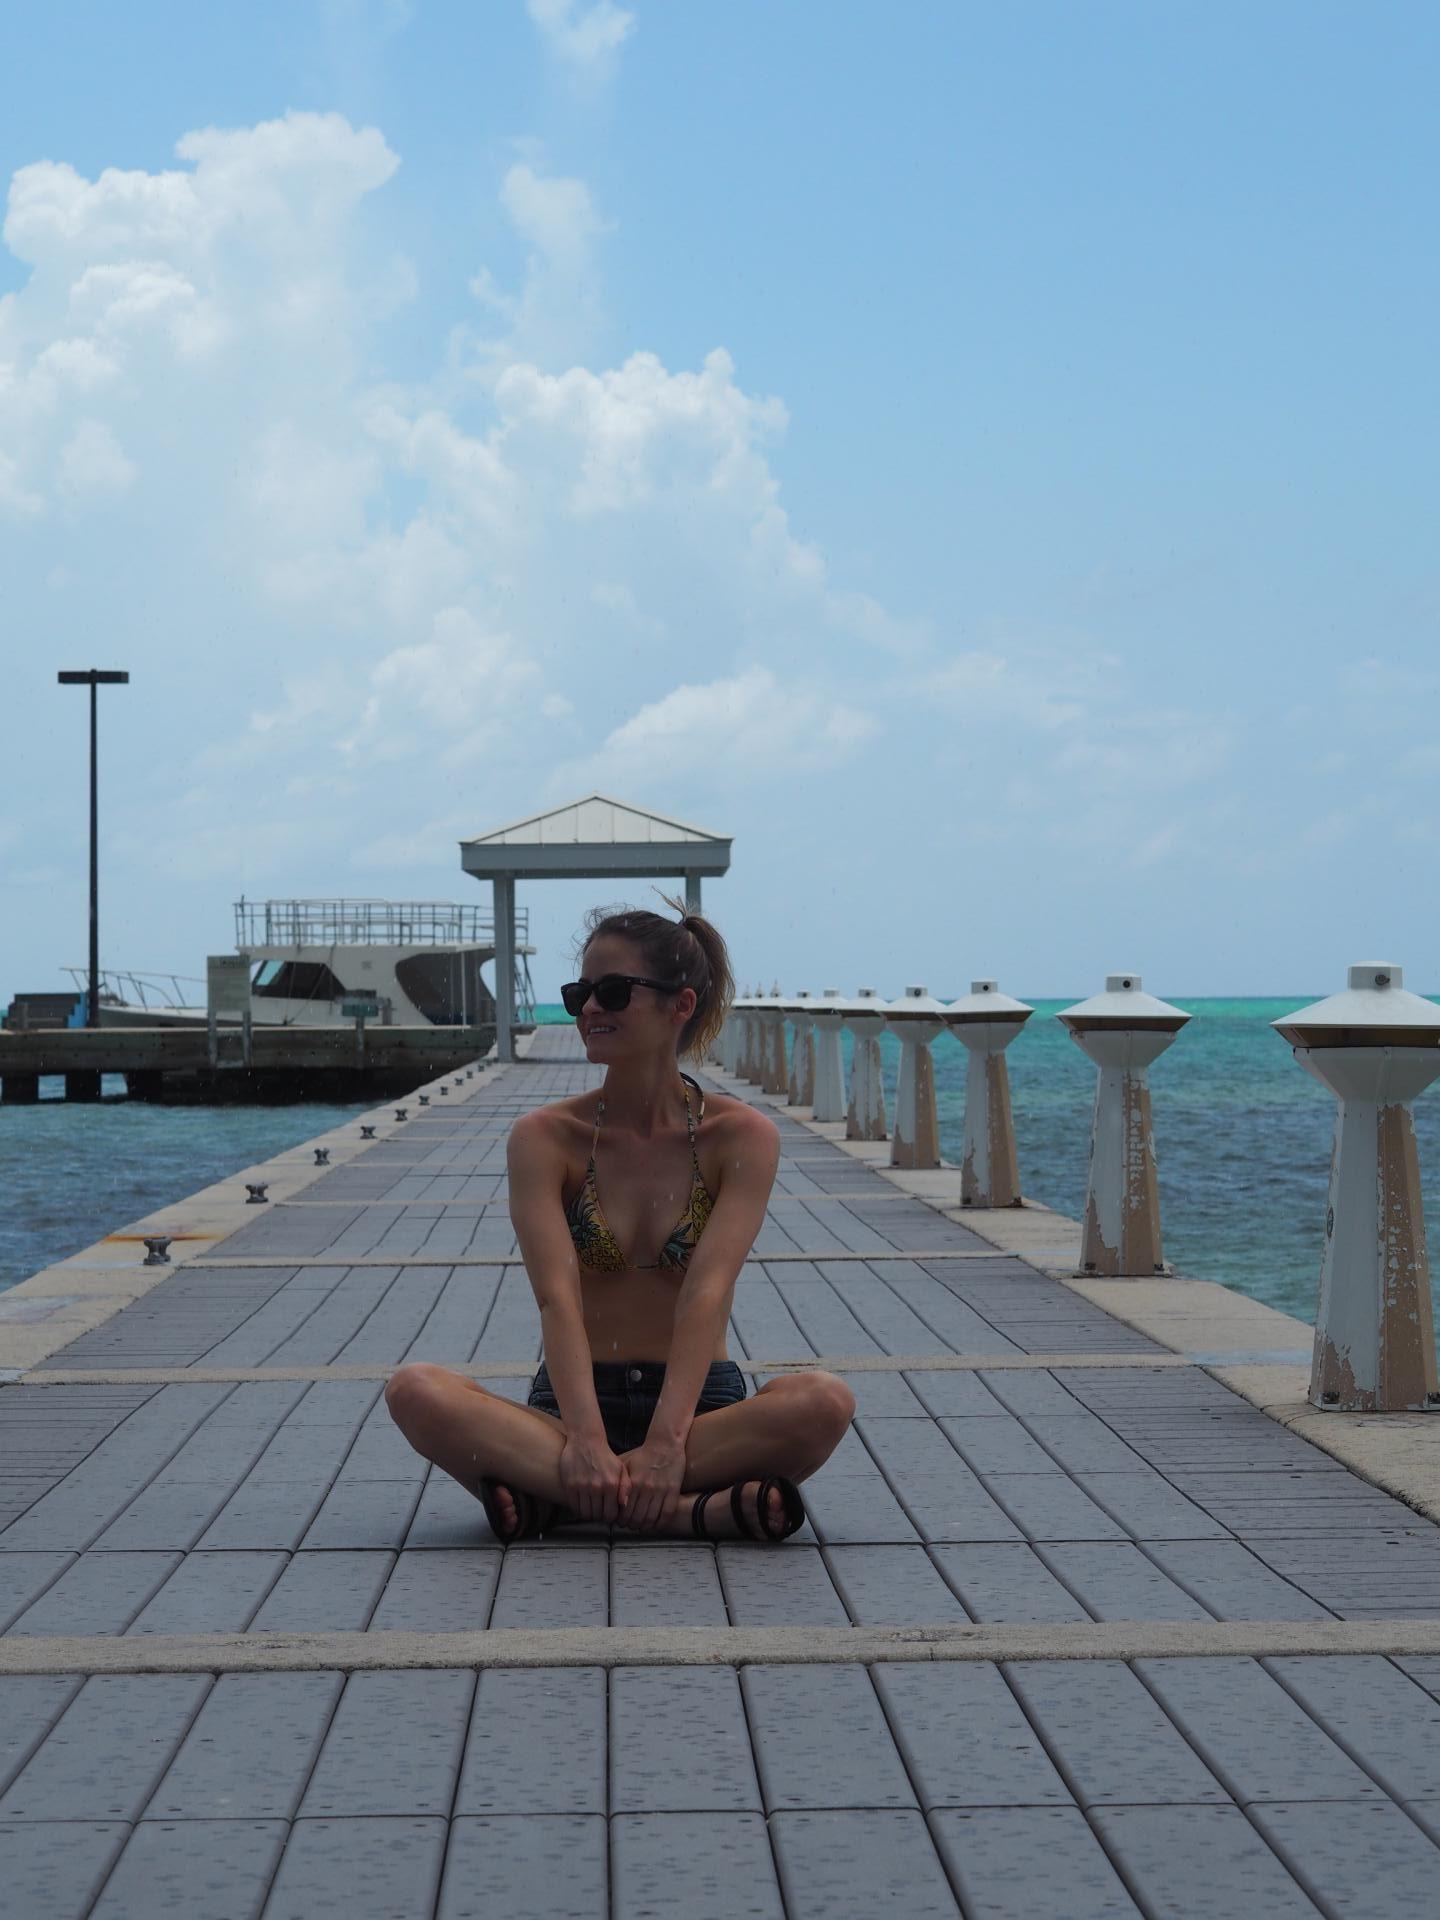 Cayman Brac - Le Soleil d'Or Cayman Islands - Photo Tutorial by Jamie 4